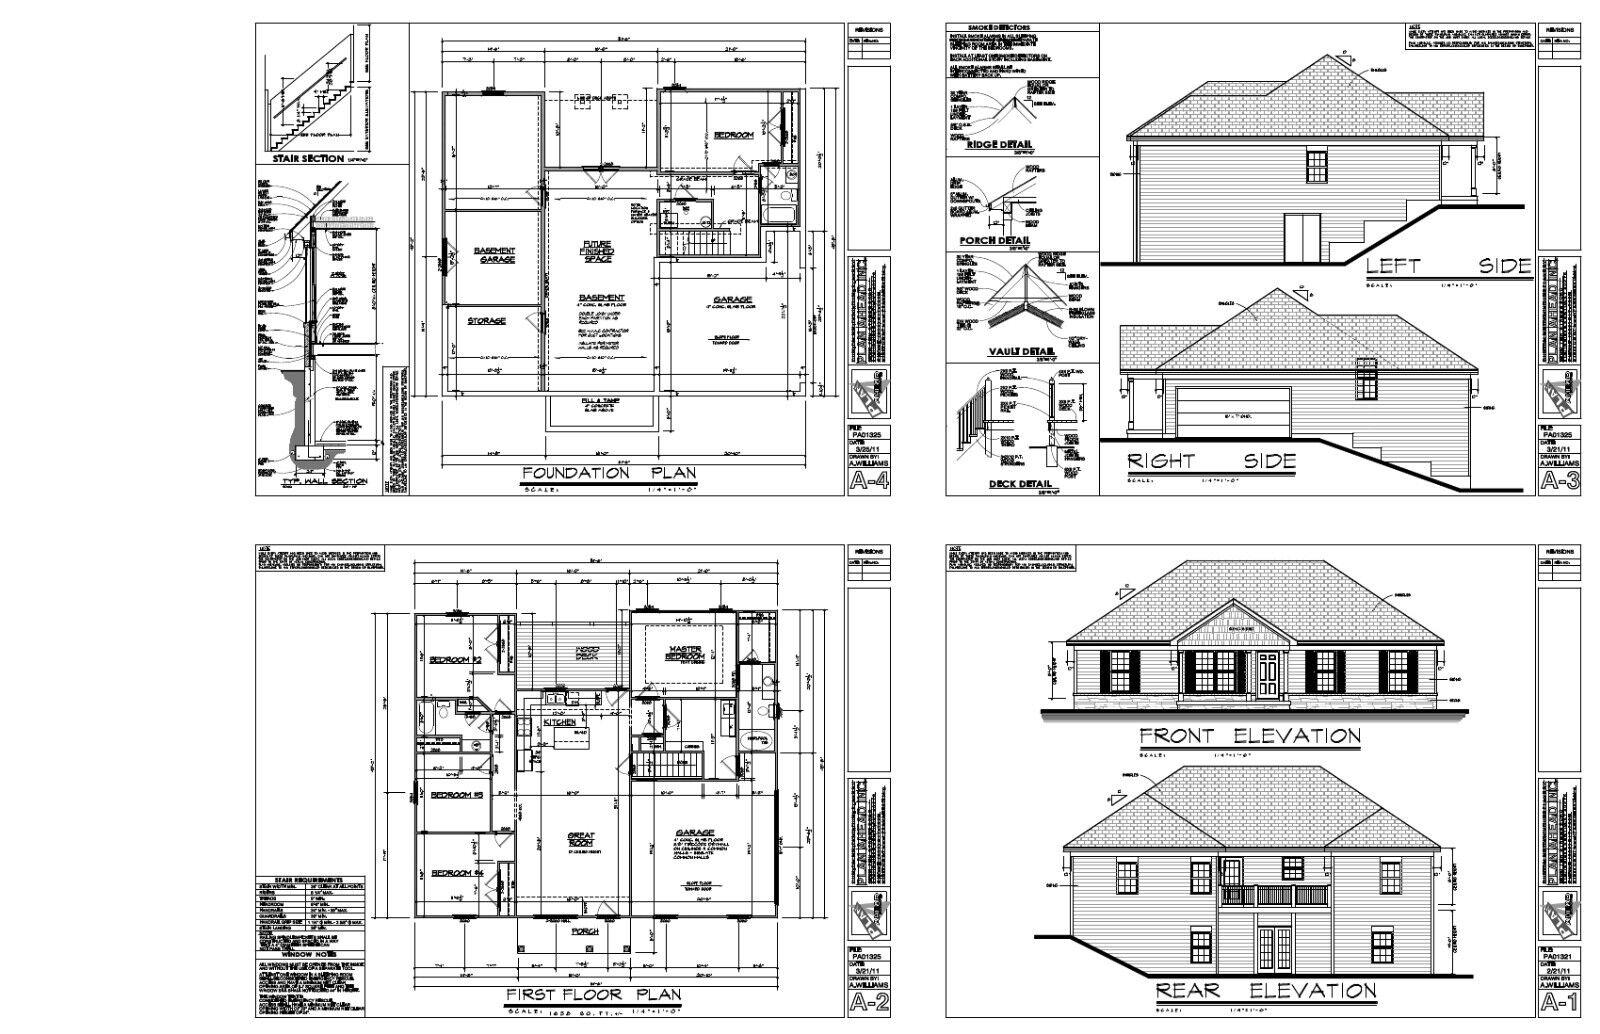 1638sf ranch house plan w garage on basement for Garage basement house plans